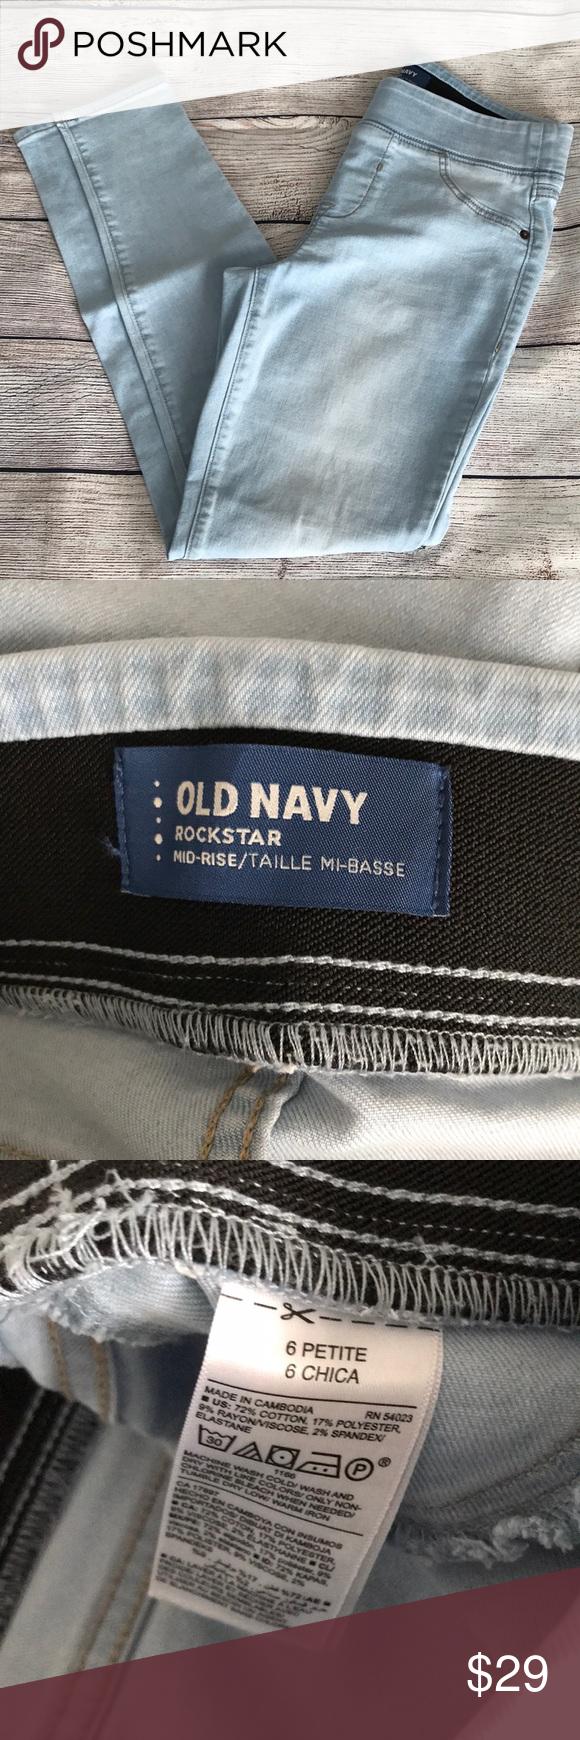 Old Navy Rockstar Jeggings Old Navy Rockstar Jeggings